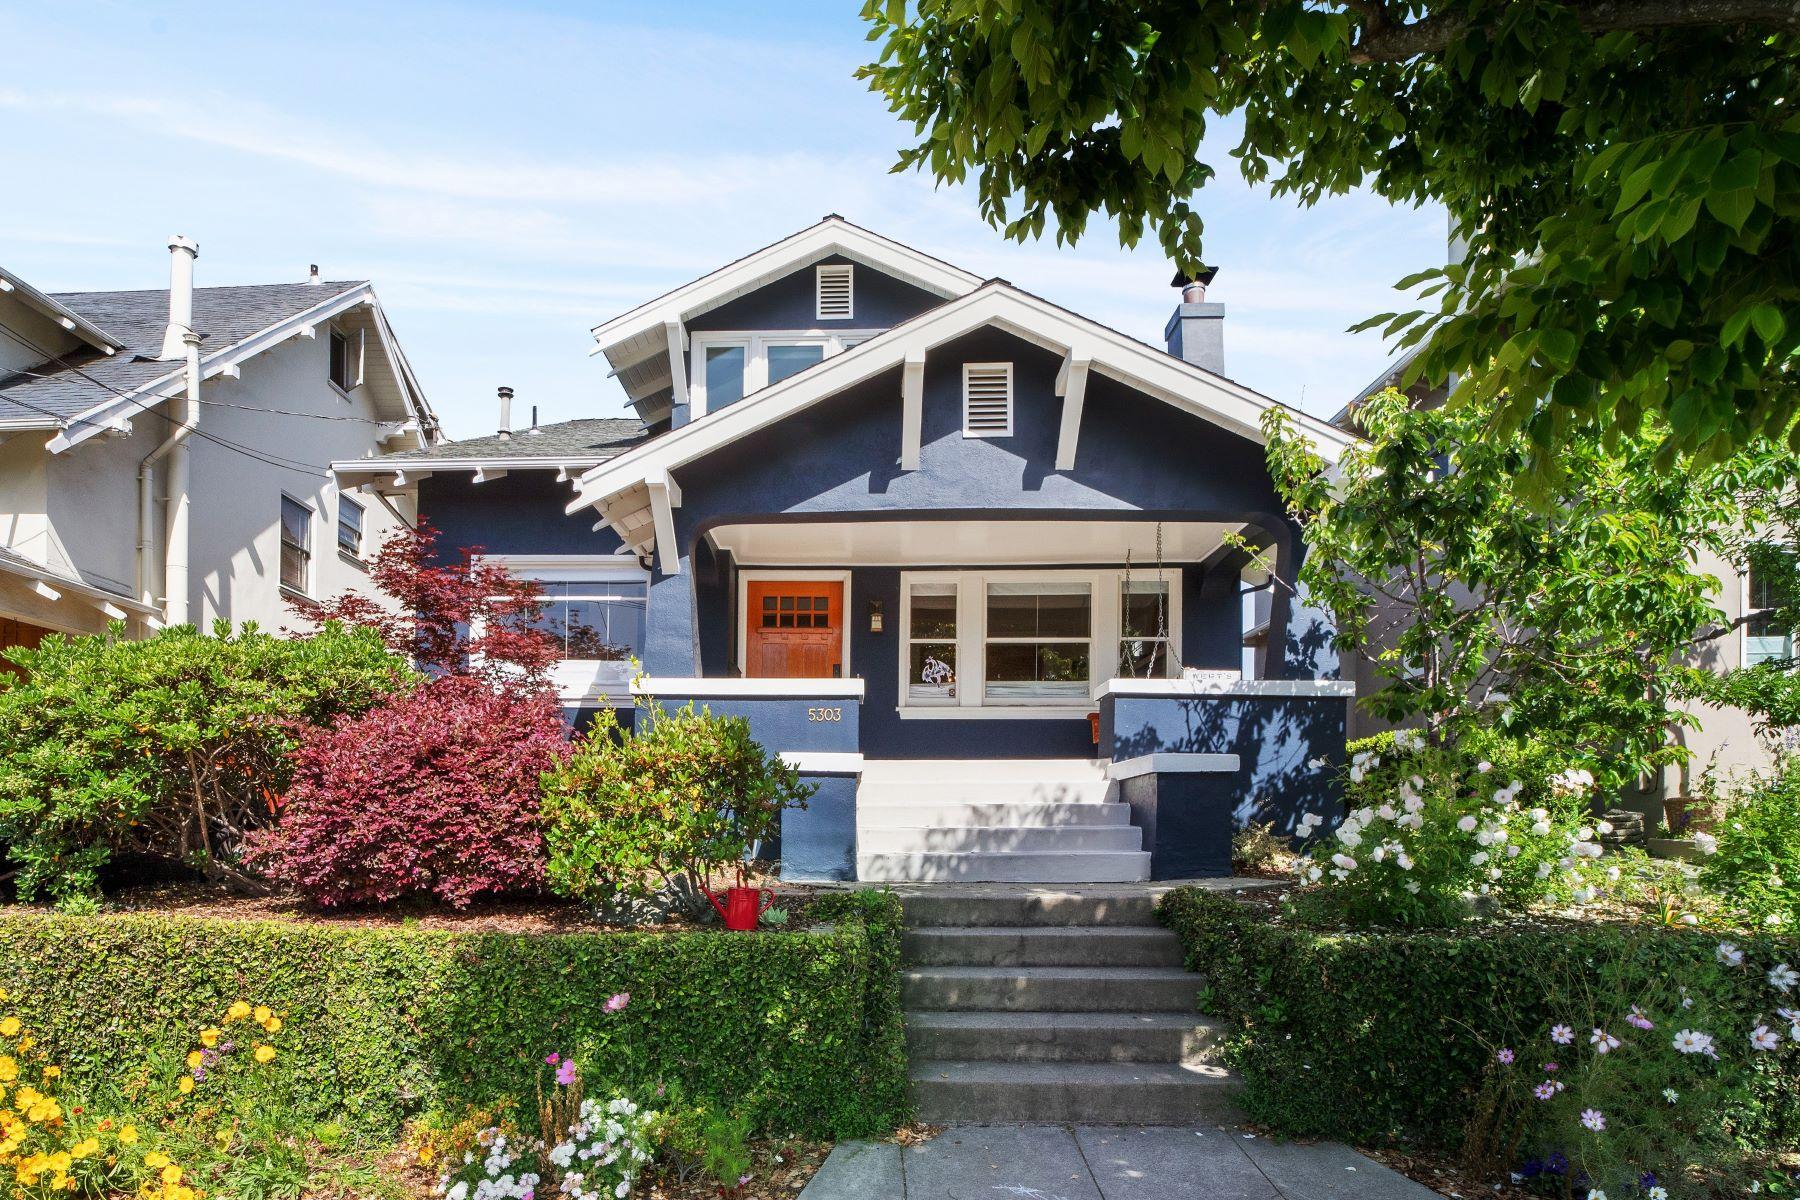 Single Family Homes for Active at Craftman In Rockridge 5303 Lawton Avenue Oakland, California 94618 United States